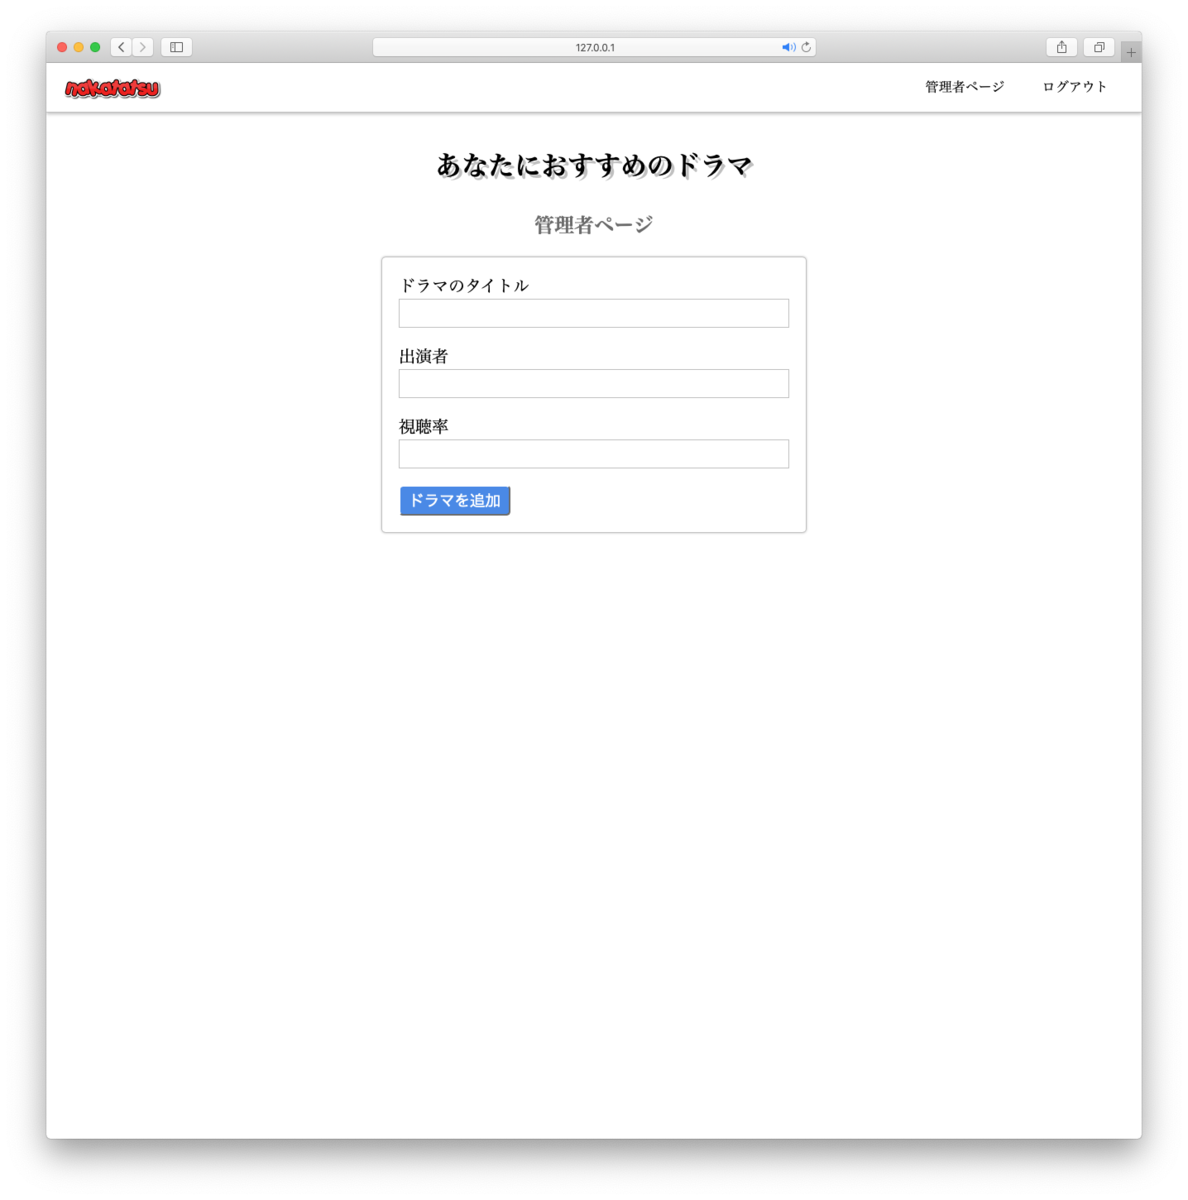 f:id:nakatatsu_com:20190614220513p:plain